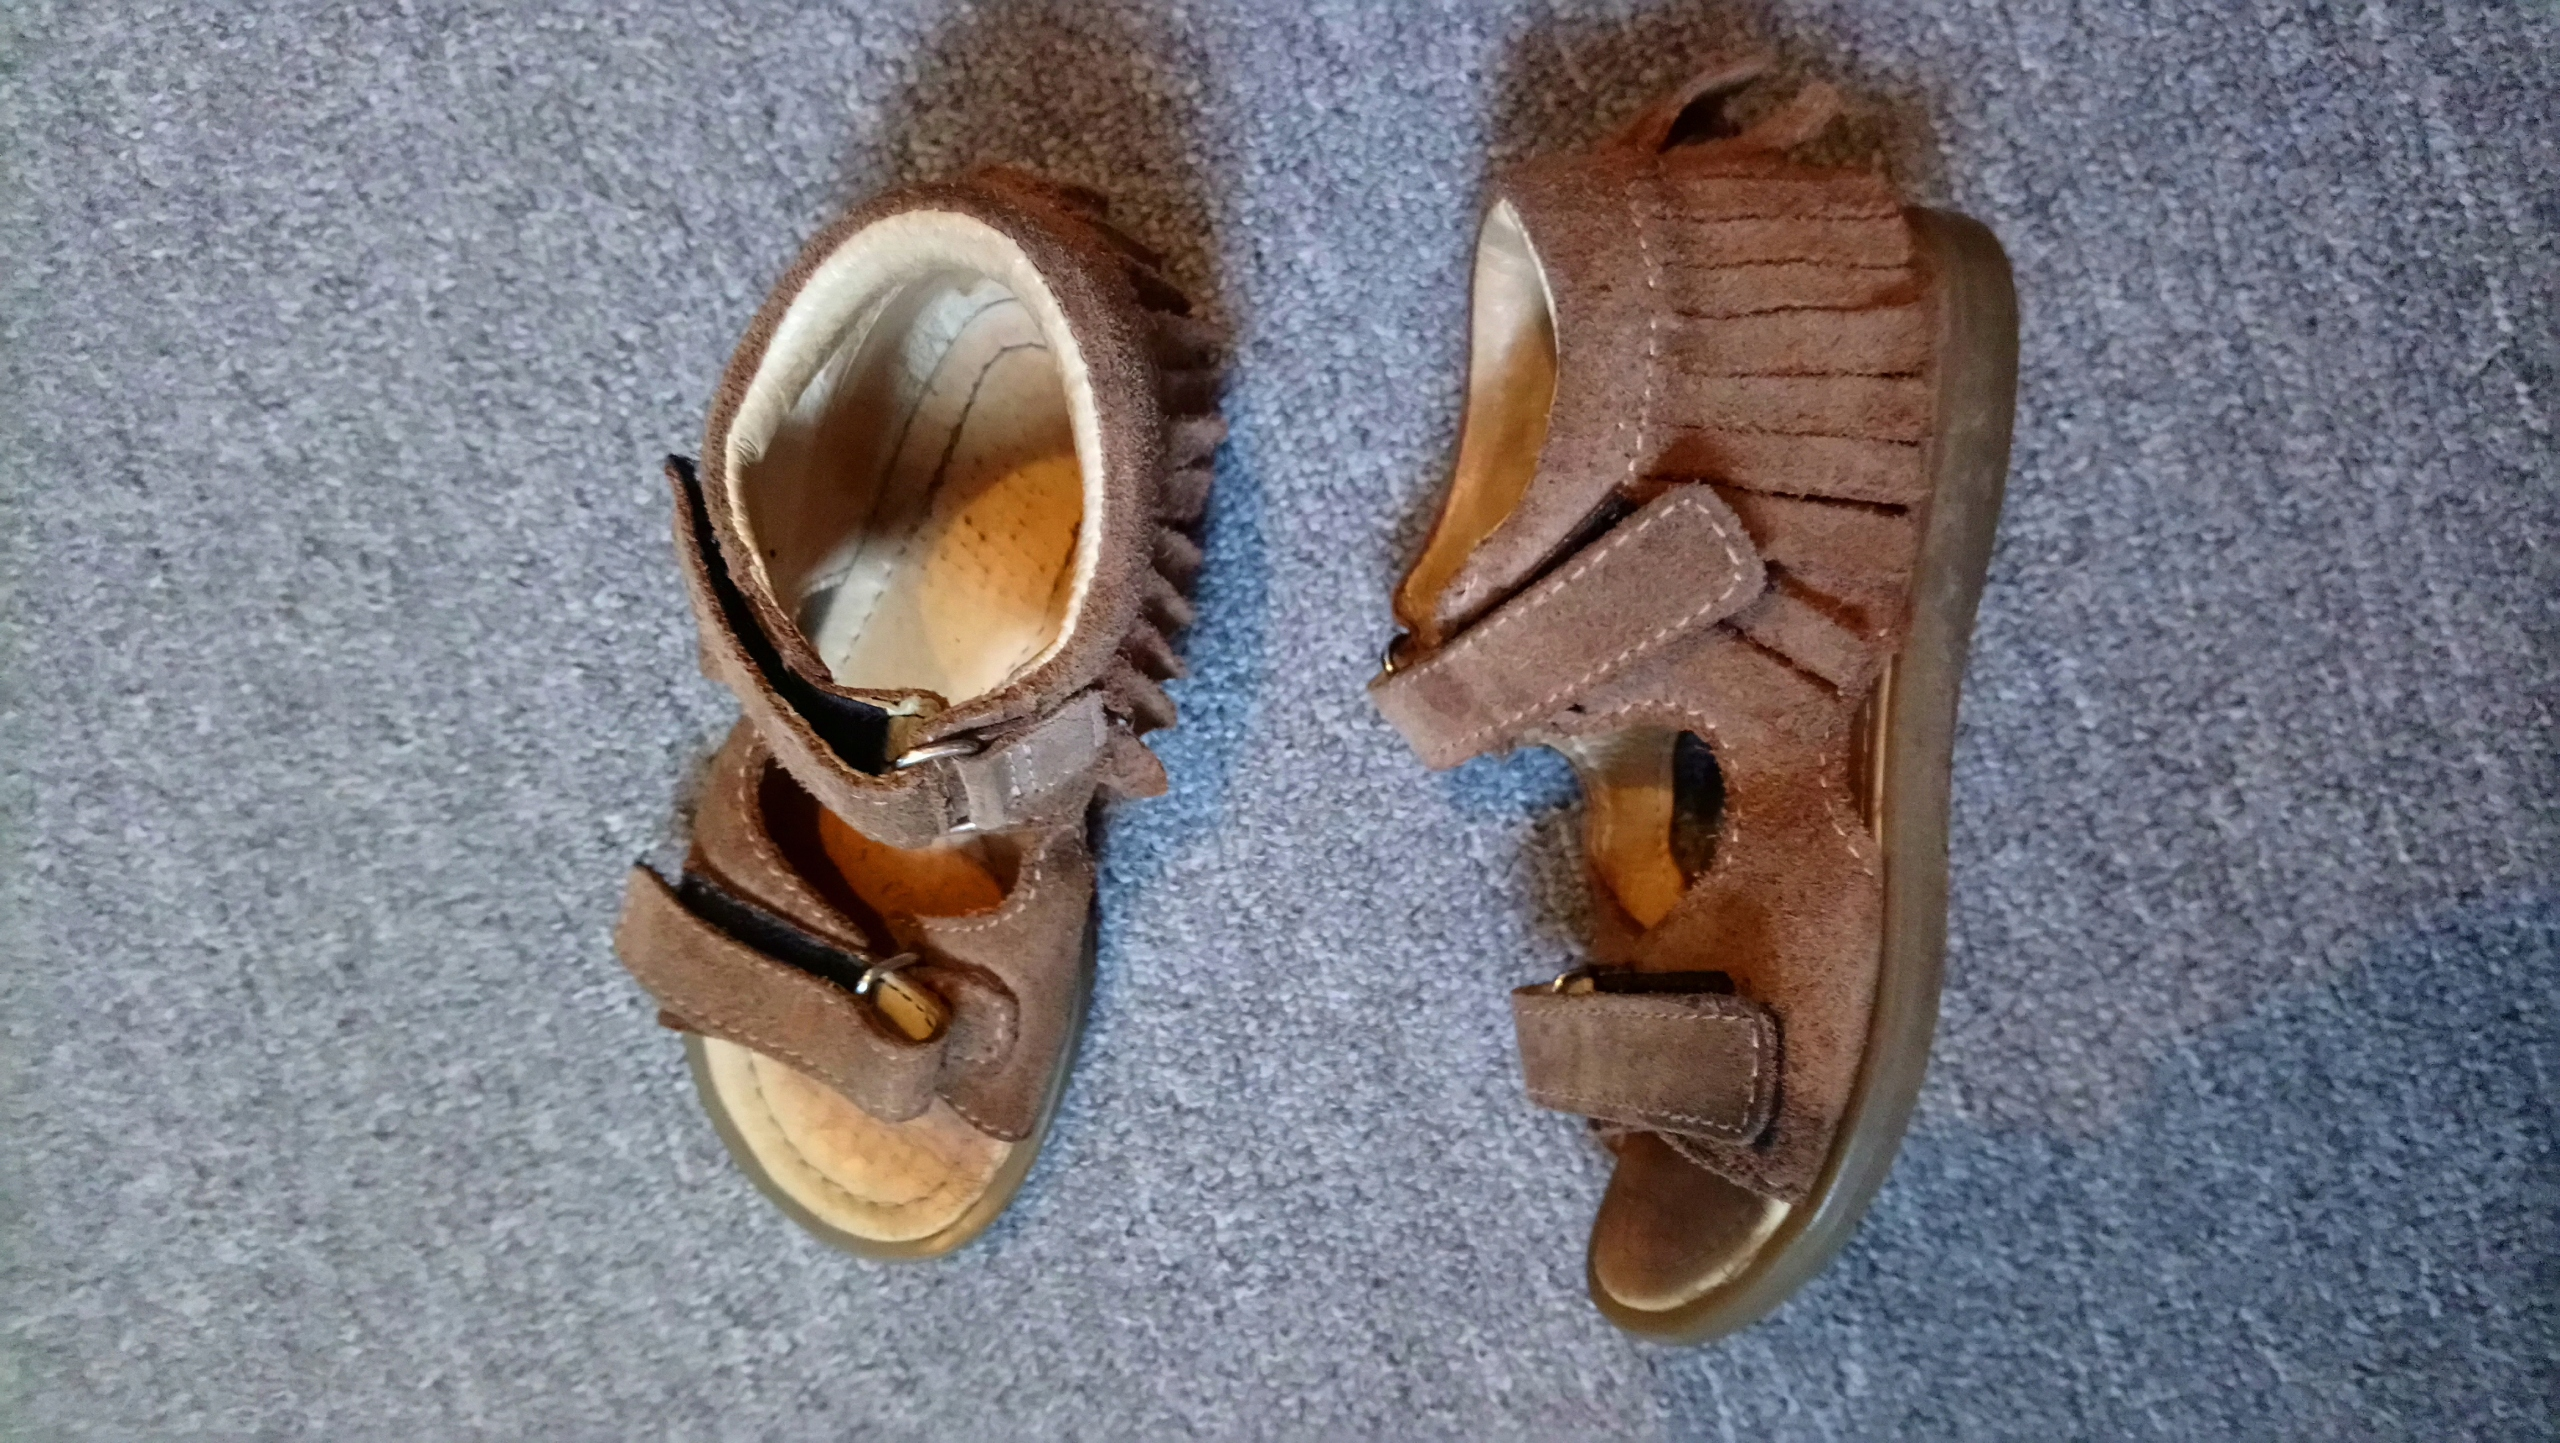 Mrugała sandały Indian summer roz 25